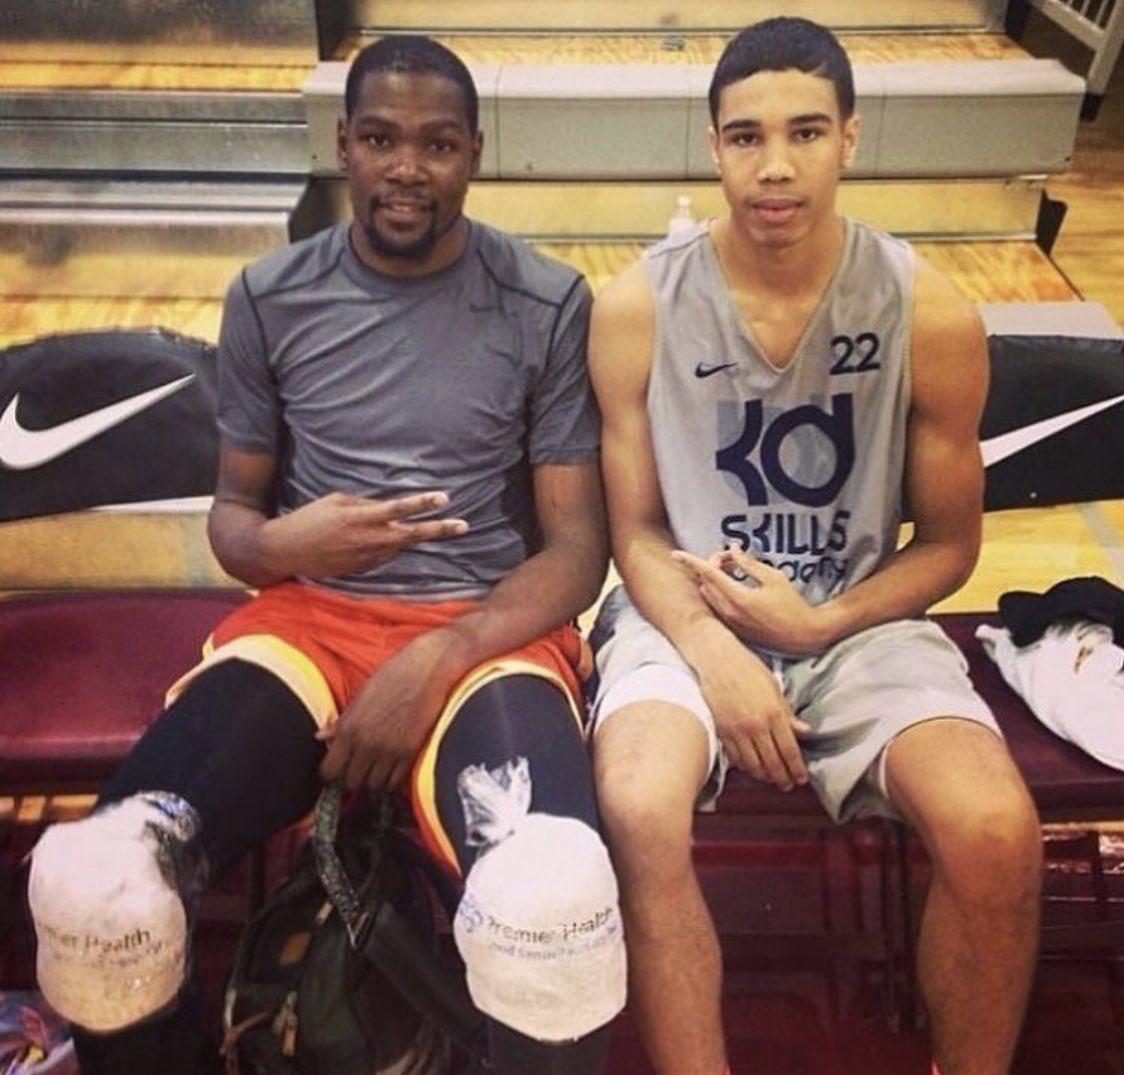 RT @BostonCelts4eva: Kevin Durant to Jayson Tatum in 2014: